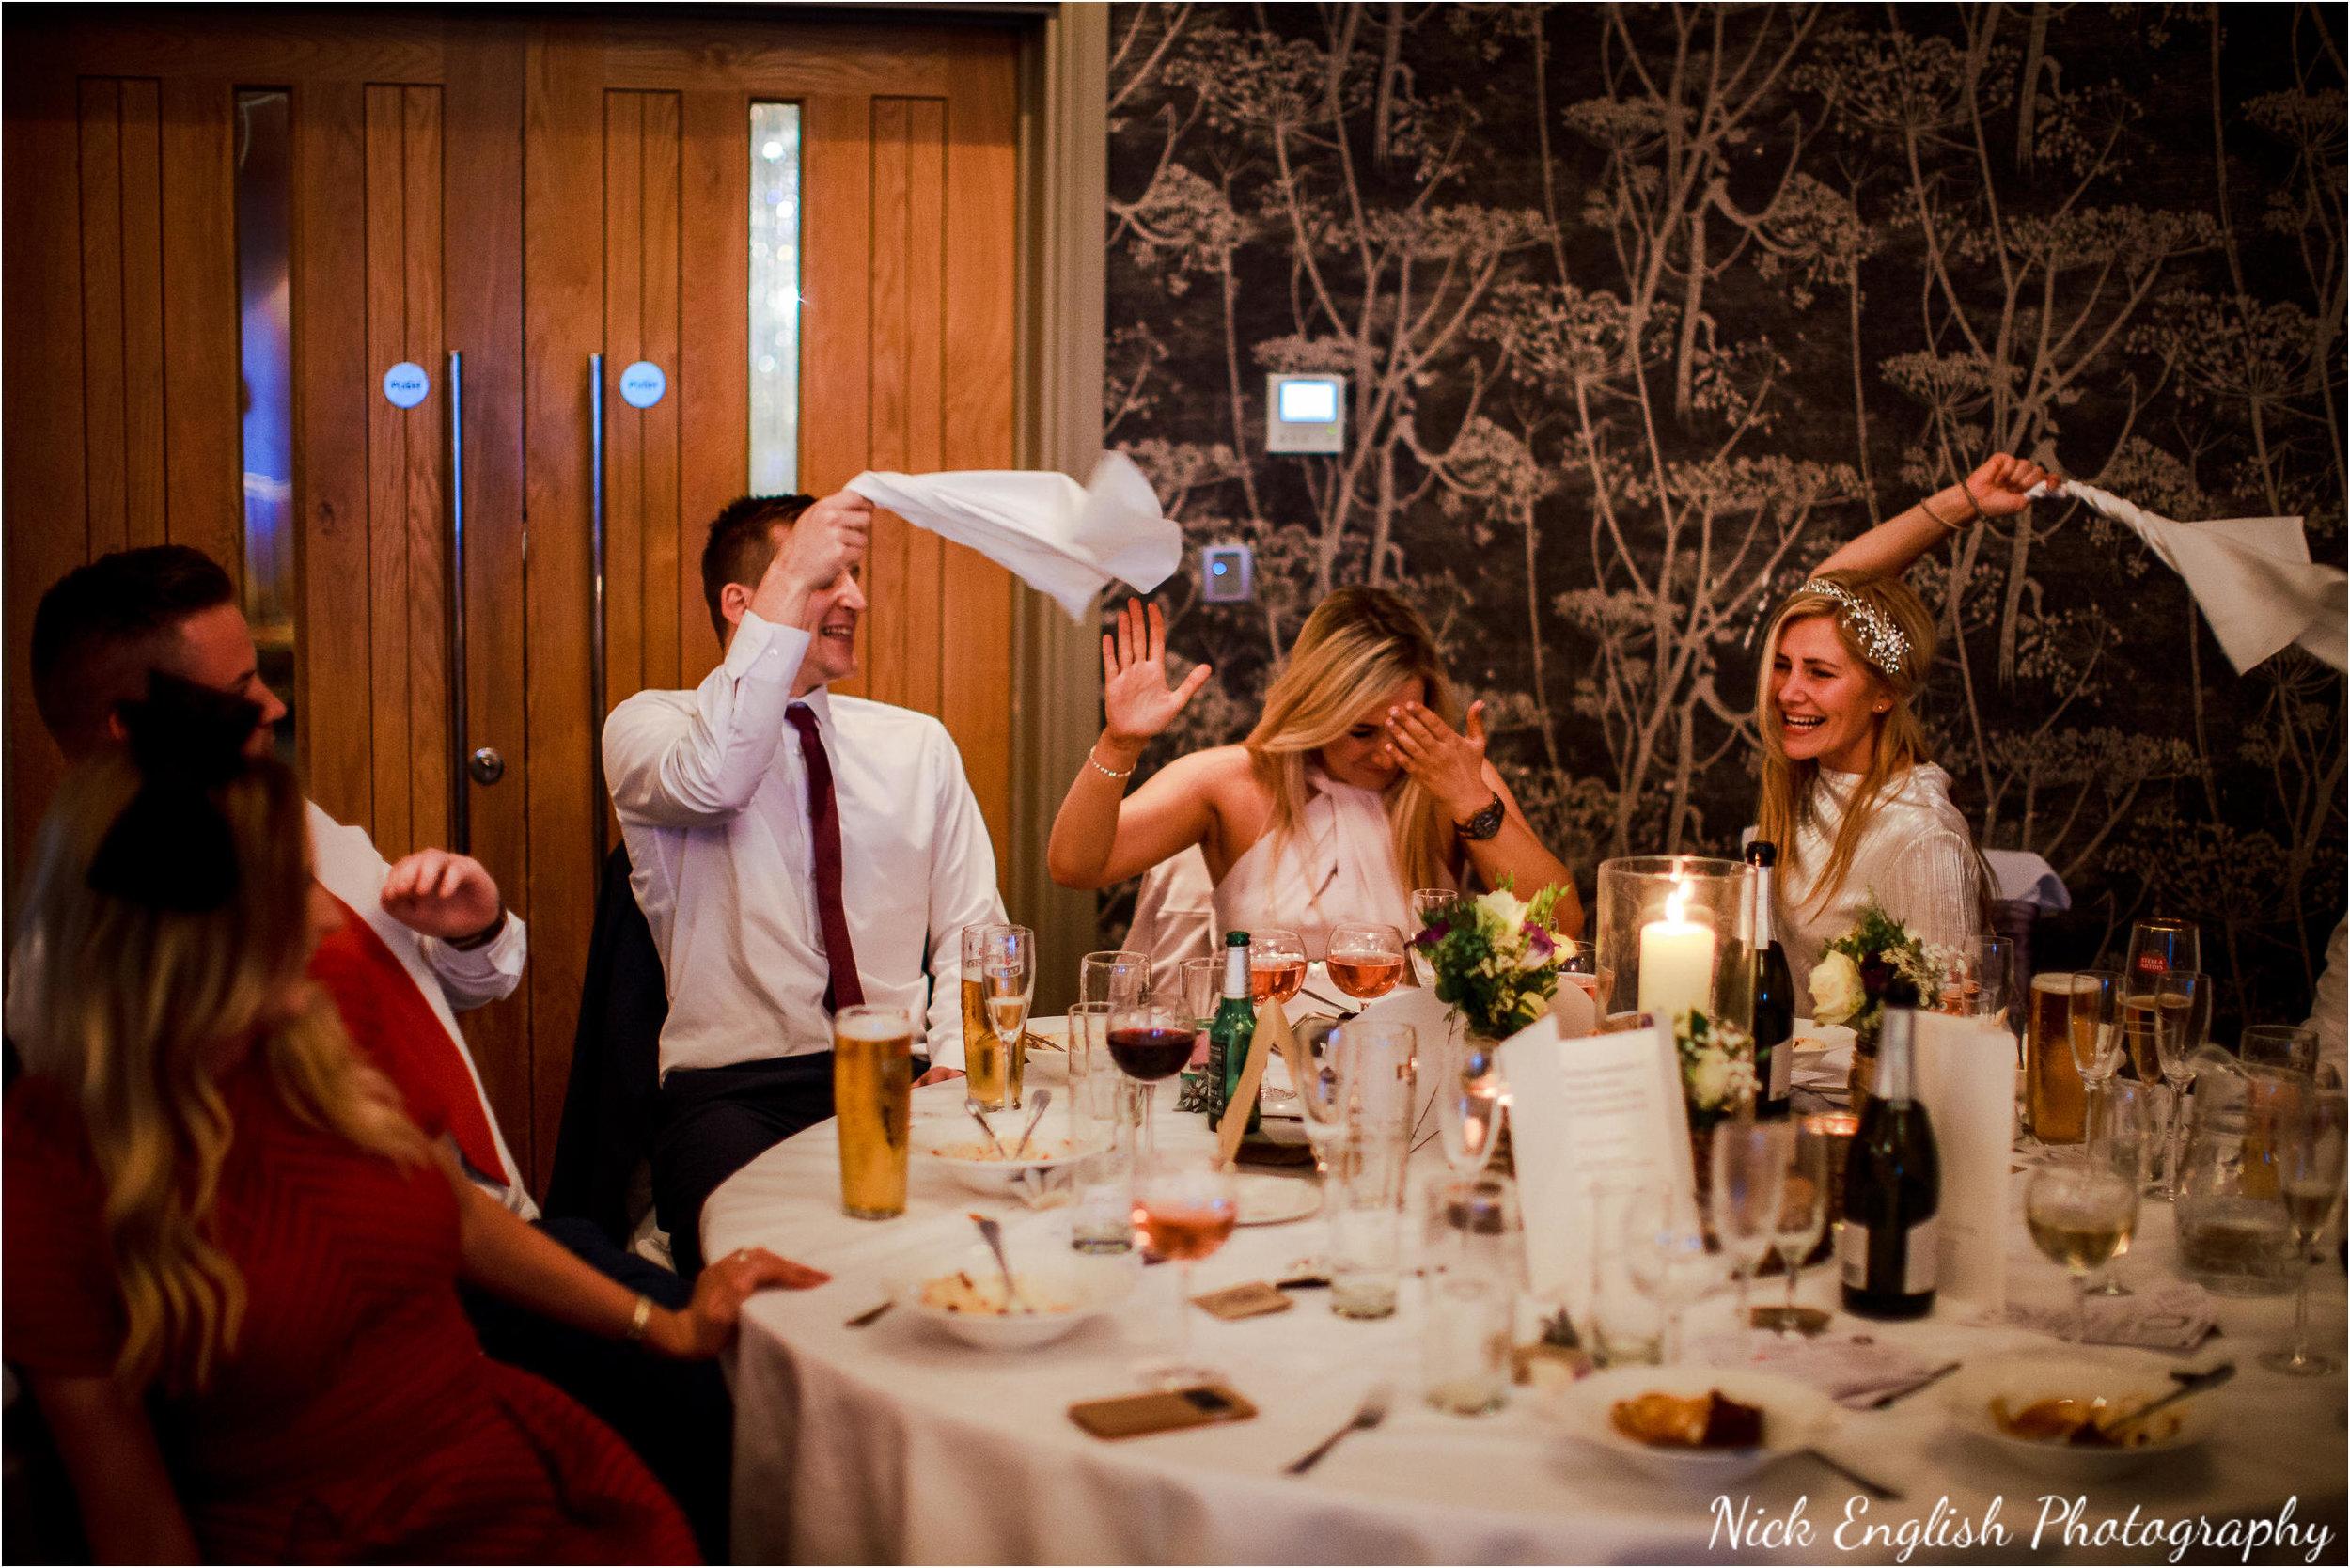 Stacey-Ash-Wedding-Photographs-Stanley-House-Preston-Lancashire-199.jpg